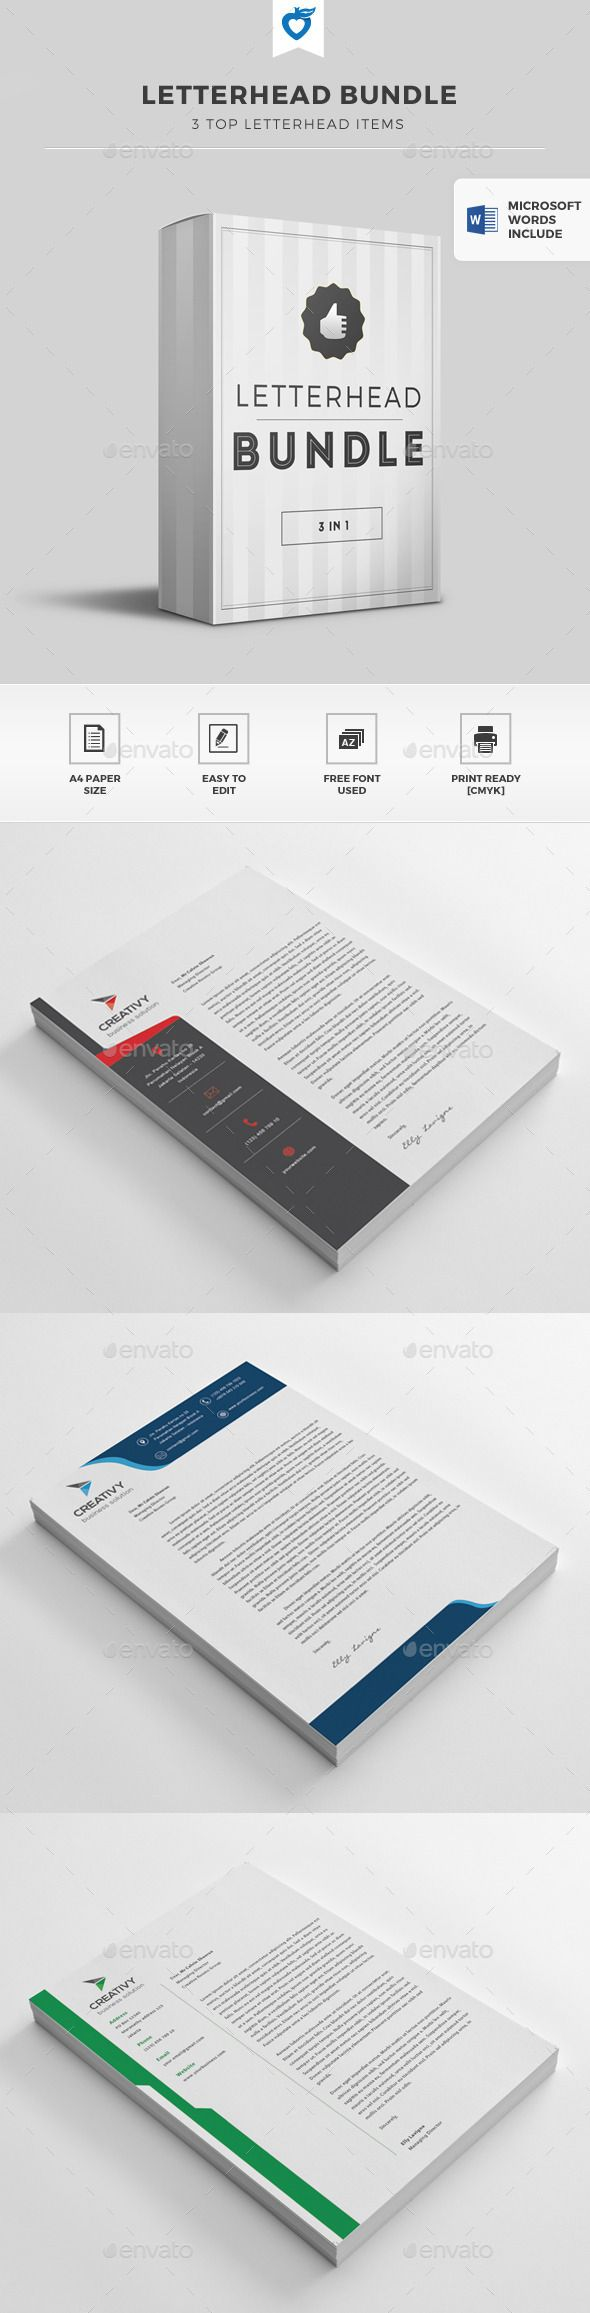 letter format on letterhead%0A Letterhead Bundle